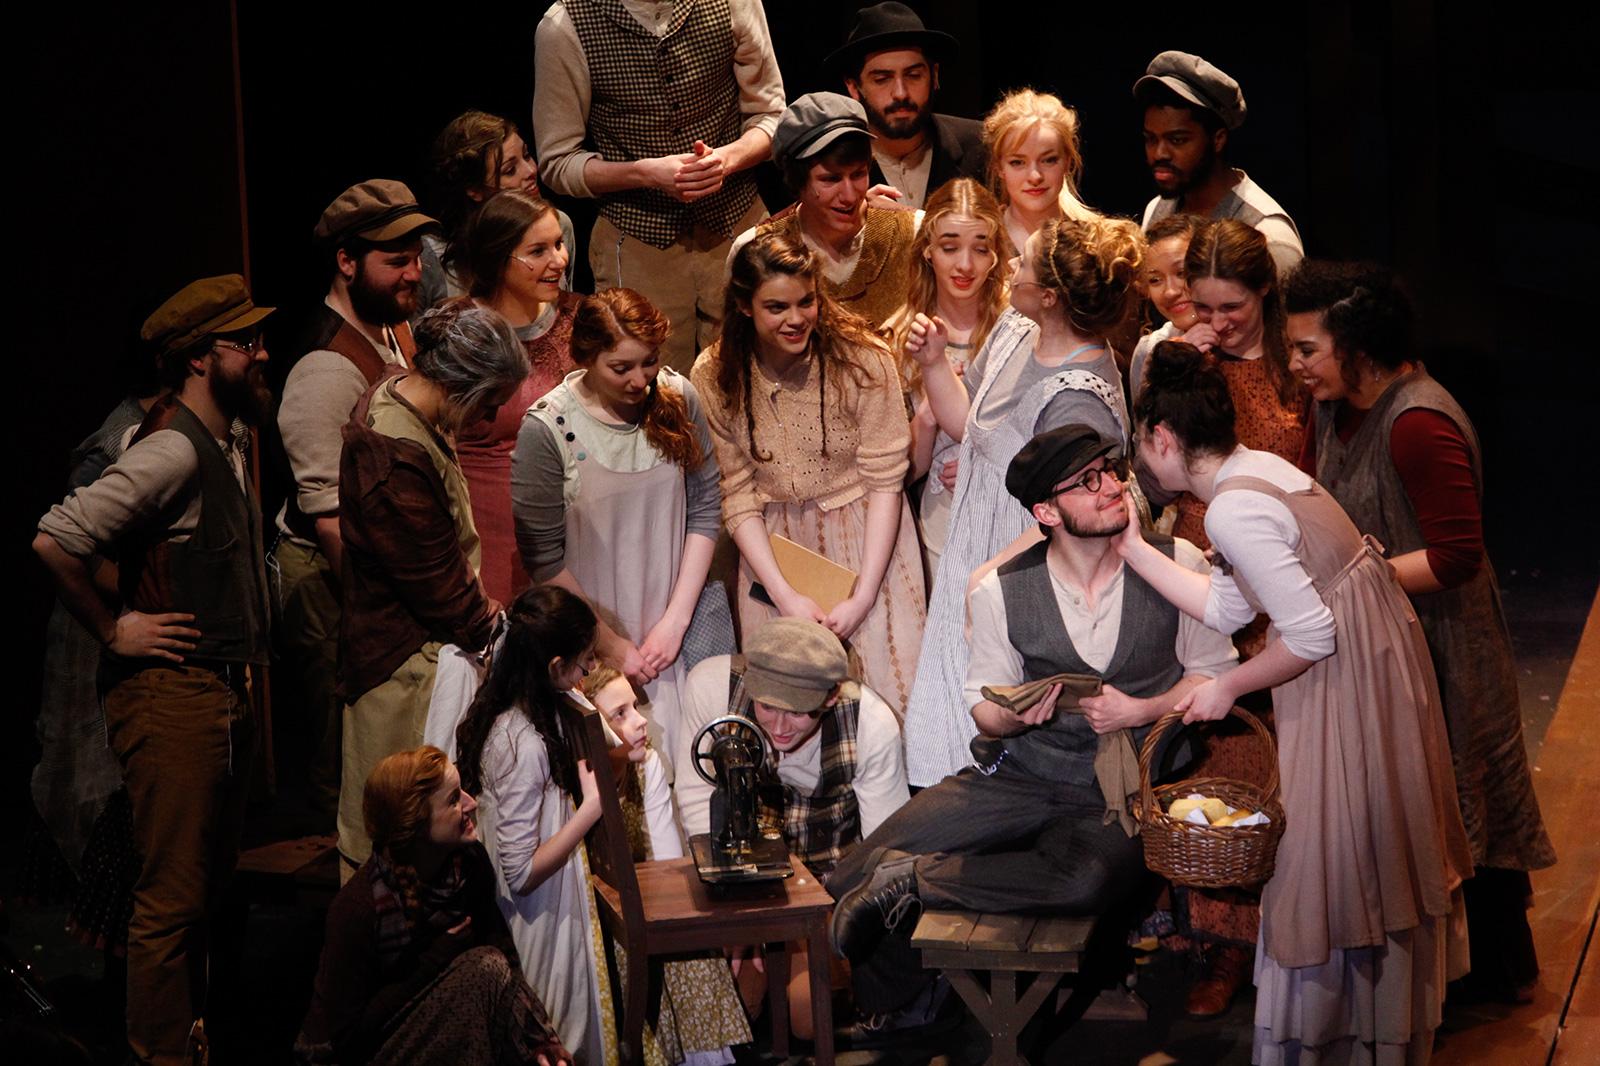 SBOCES Hosts Fiddler on the Roof Jr Auditions for Summer Theatre